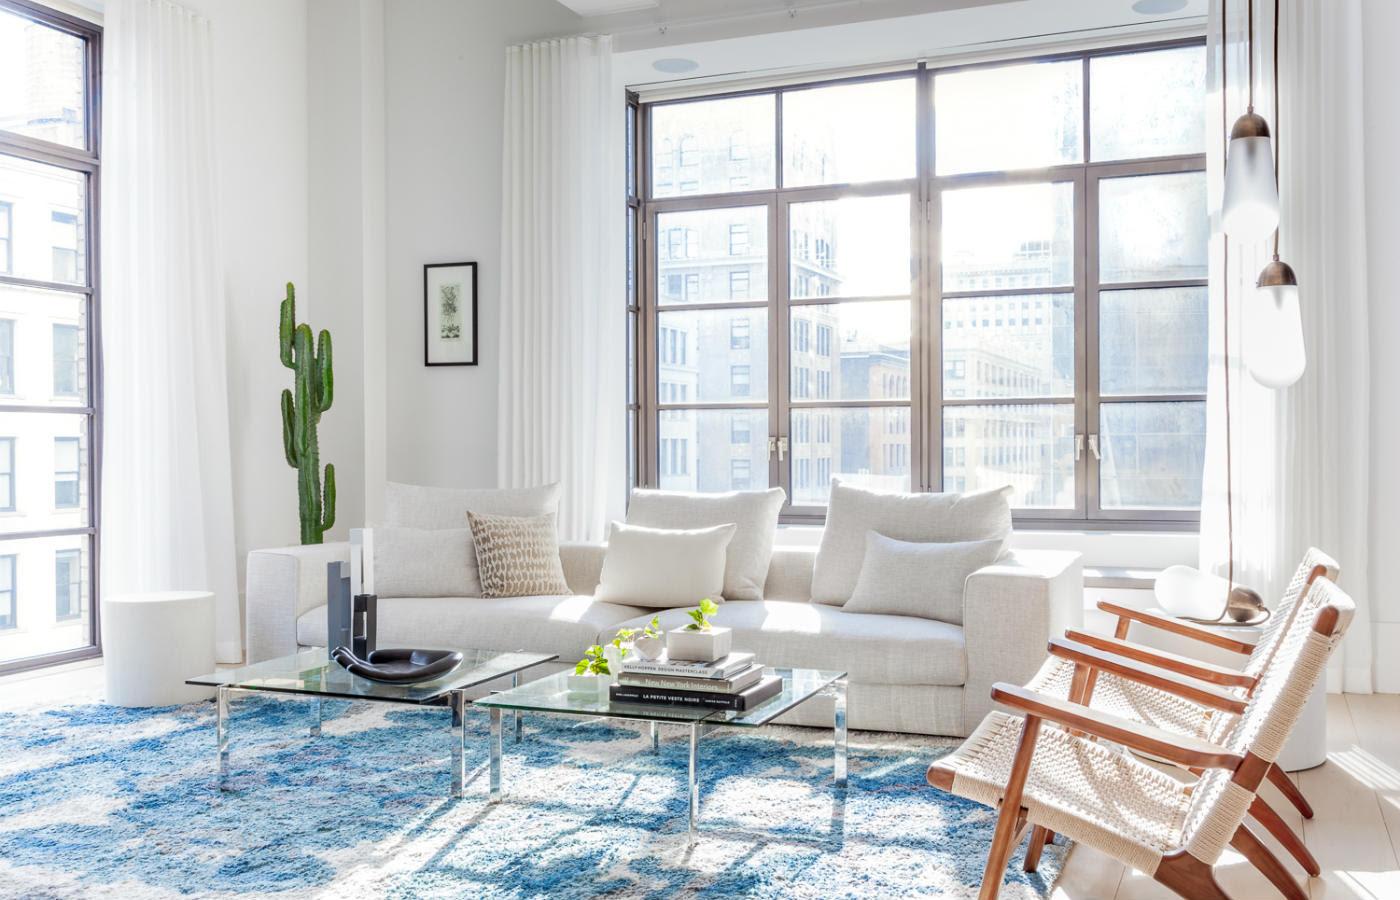 NY Studio New Design Project Creates Colorful Manhattan Apartment